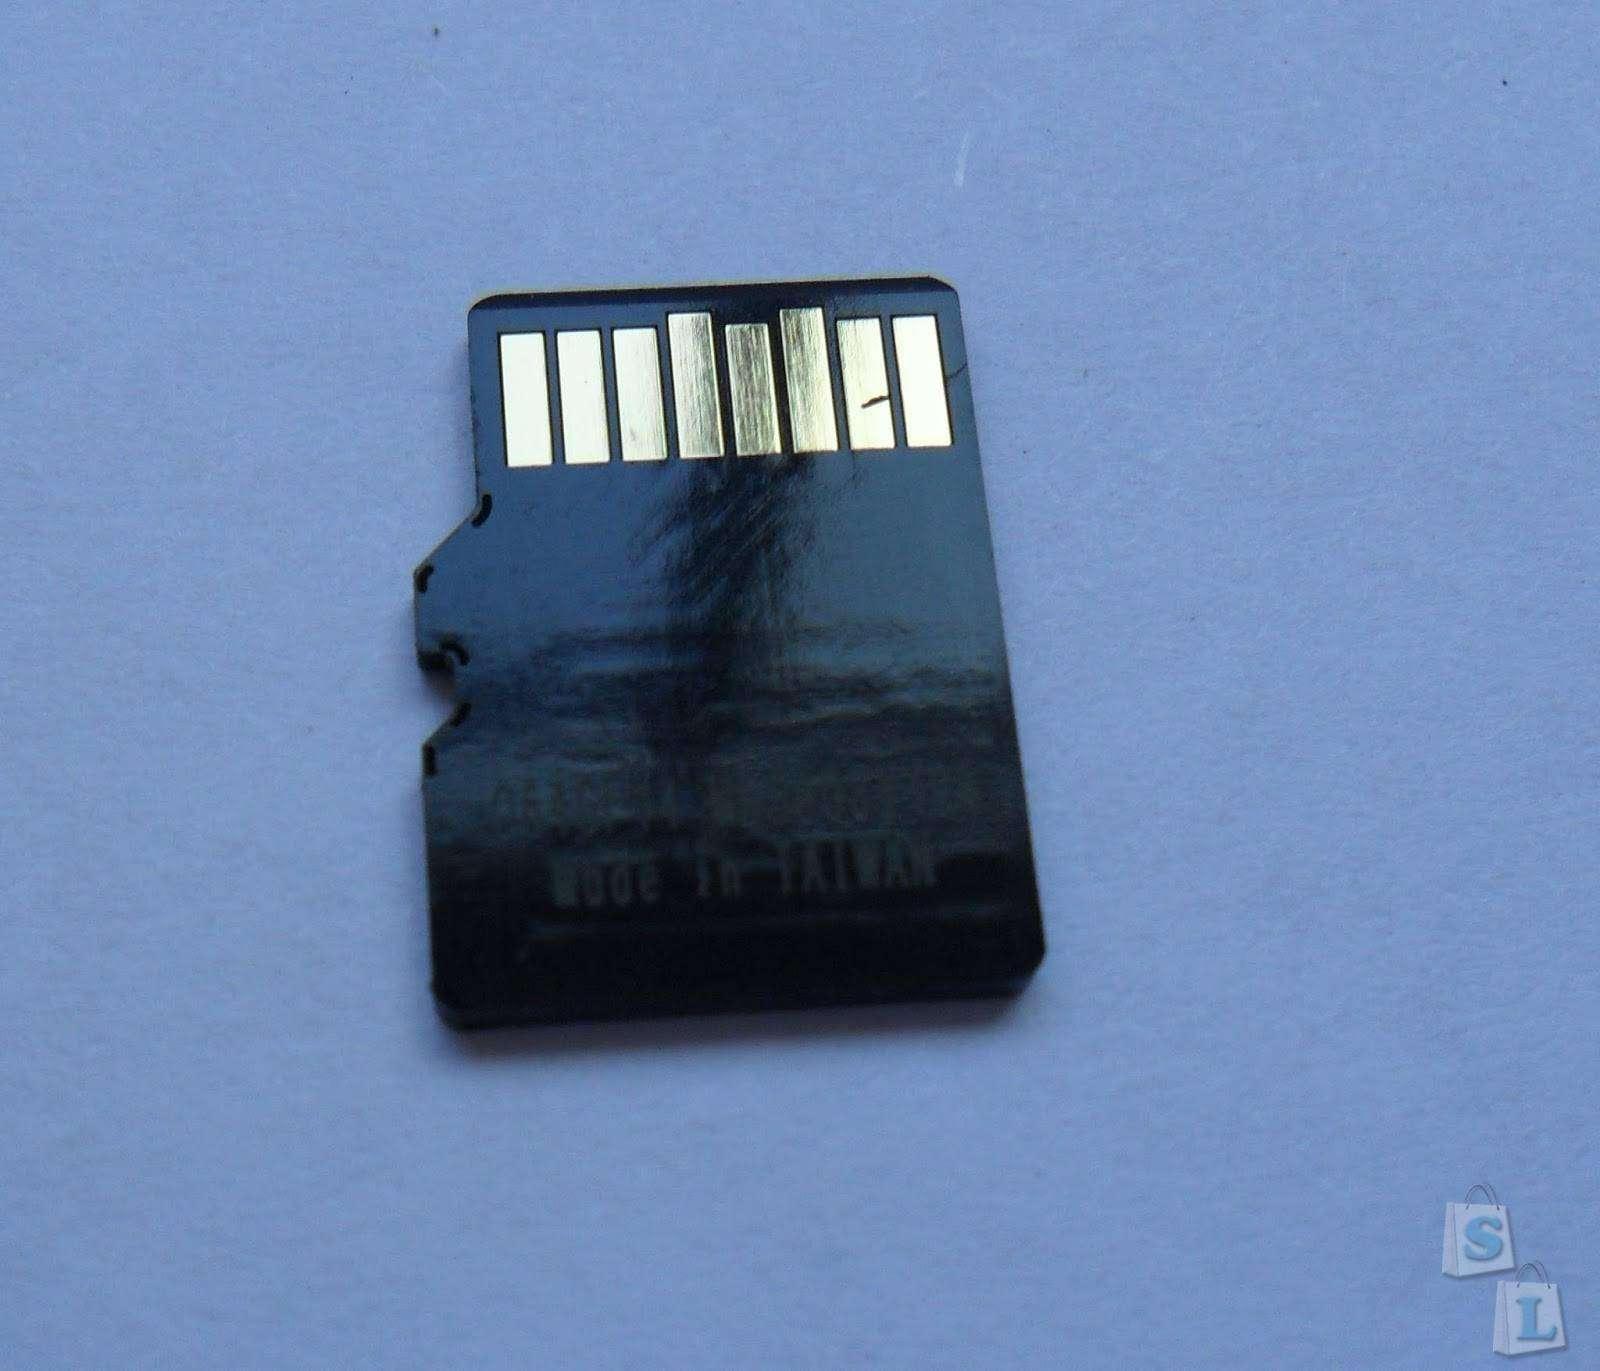 Aliexpress: Micro SD карта 10 класса на 64 Гб от LD